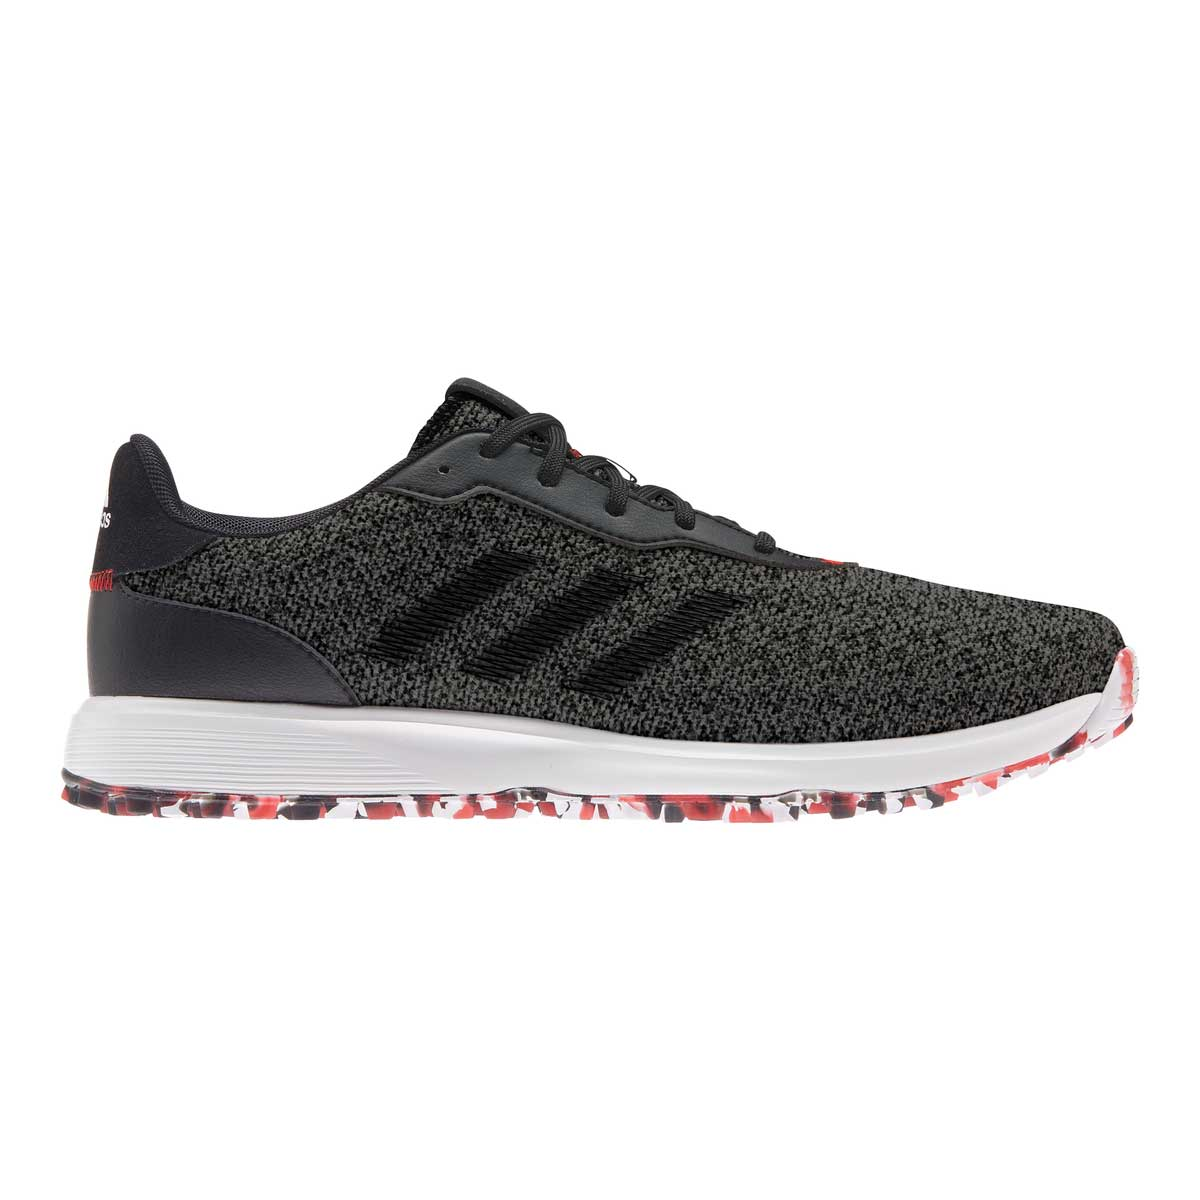 Adidas Men's S2G Grey/Black/Scarlet Golf Shoe